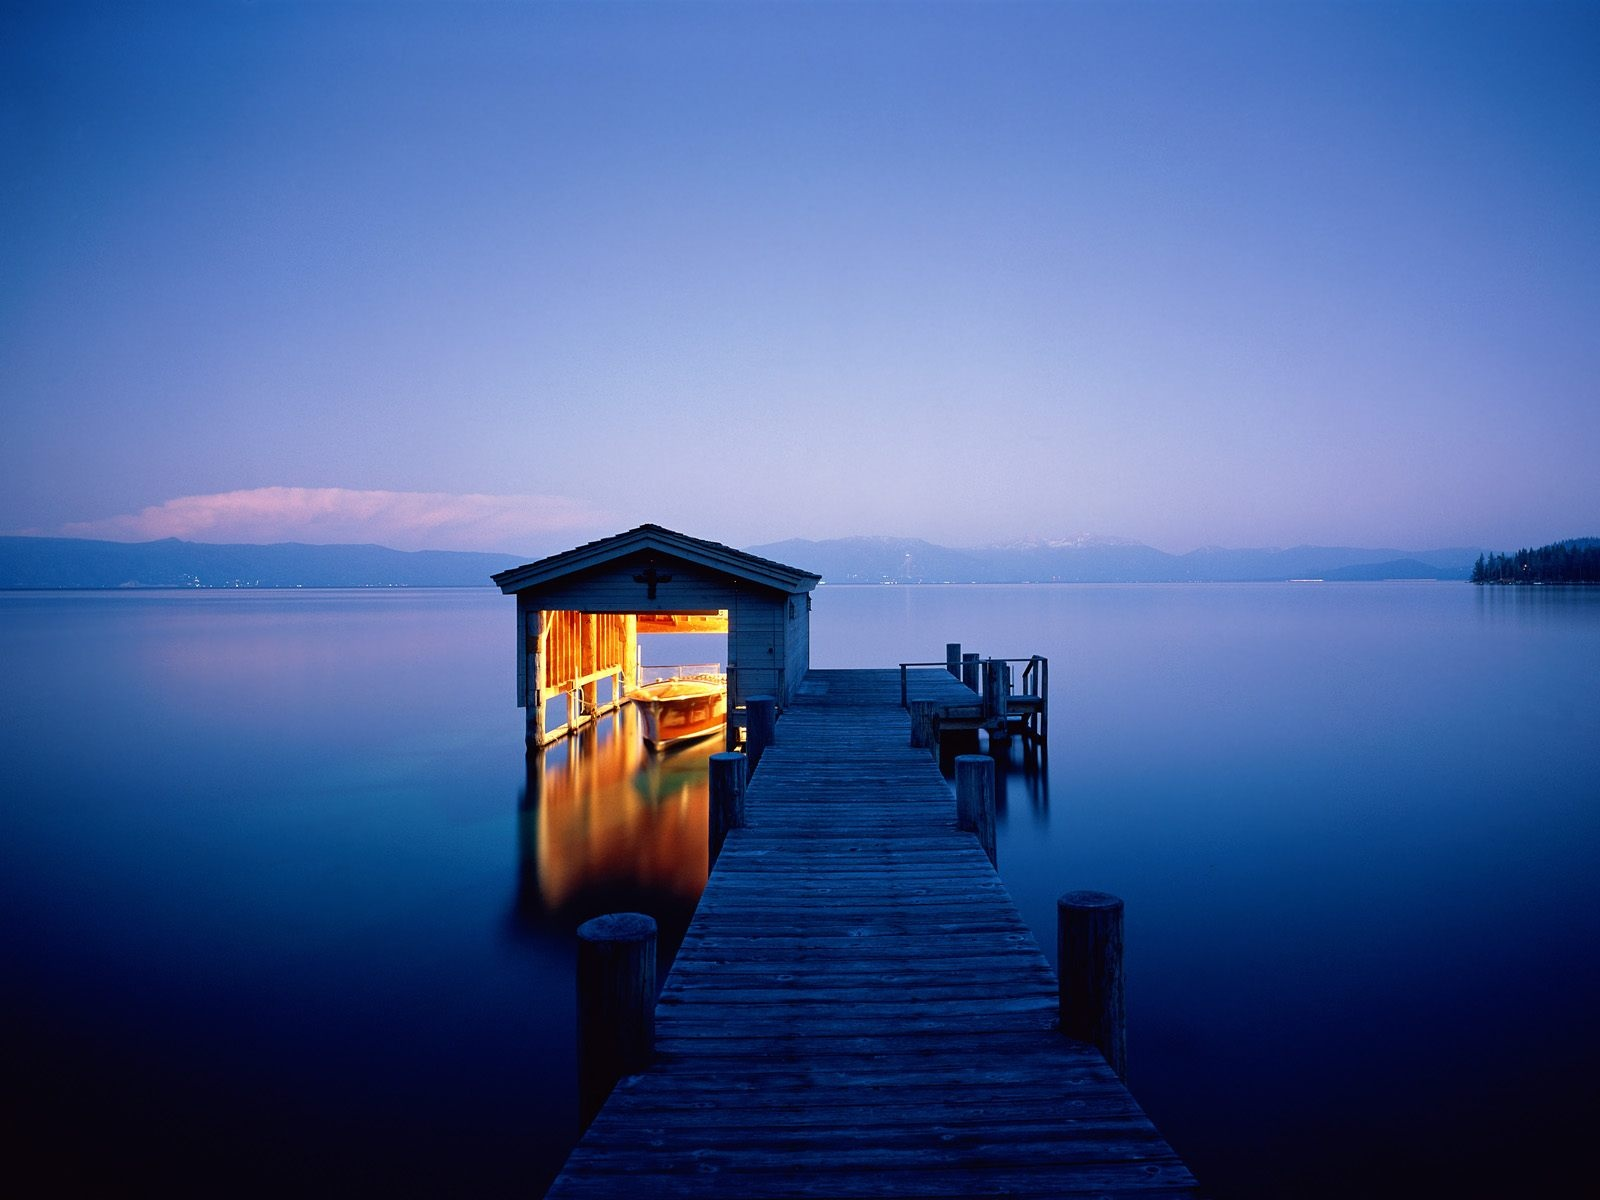 http://2.bp.blogspot.com/-BCWmKCjmvZo/TtT2Z1BYIoI/AAAAAAAAERk/SZrvjavR2Jc/s1600/quiet-getaway-lake-tahoe-nevada------1600x1200.jpg